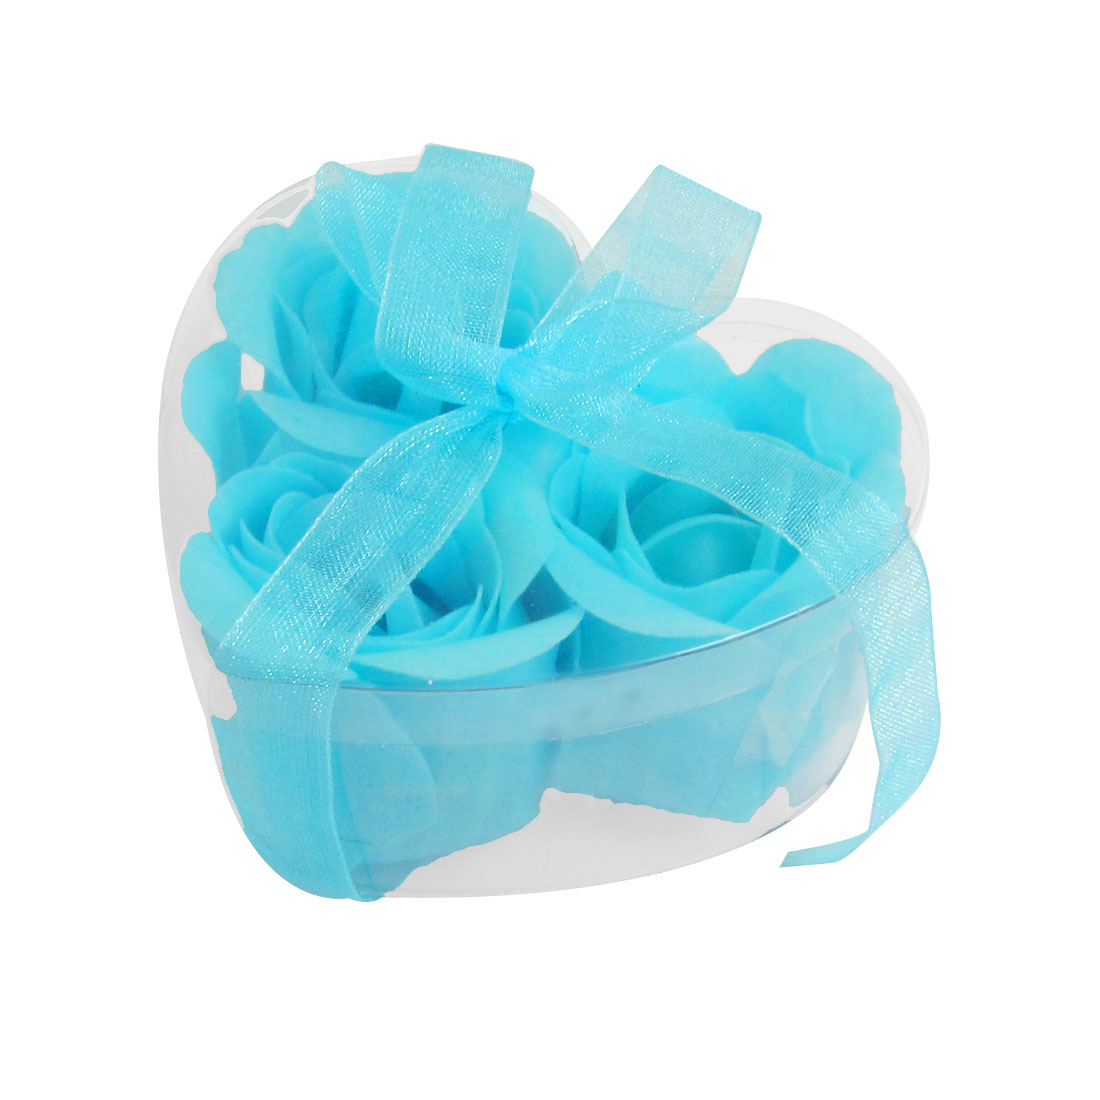 3 Pcs Blue Bowknot Detail Tub Wash Bathing Soap Rose Petals